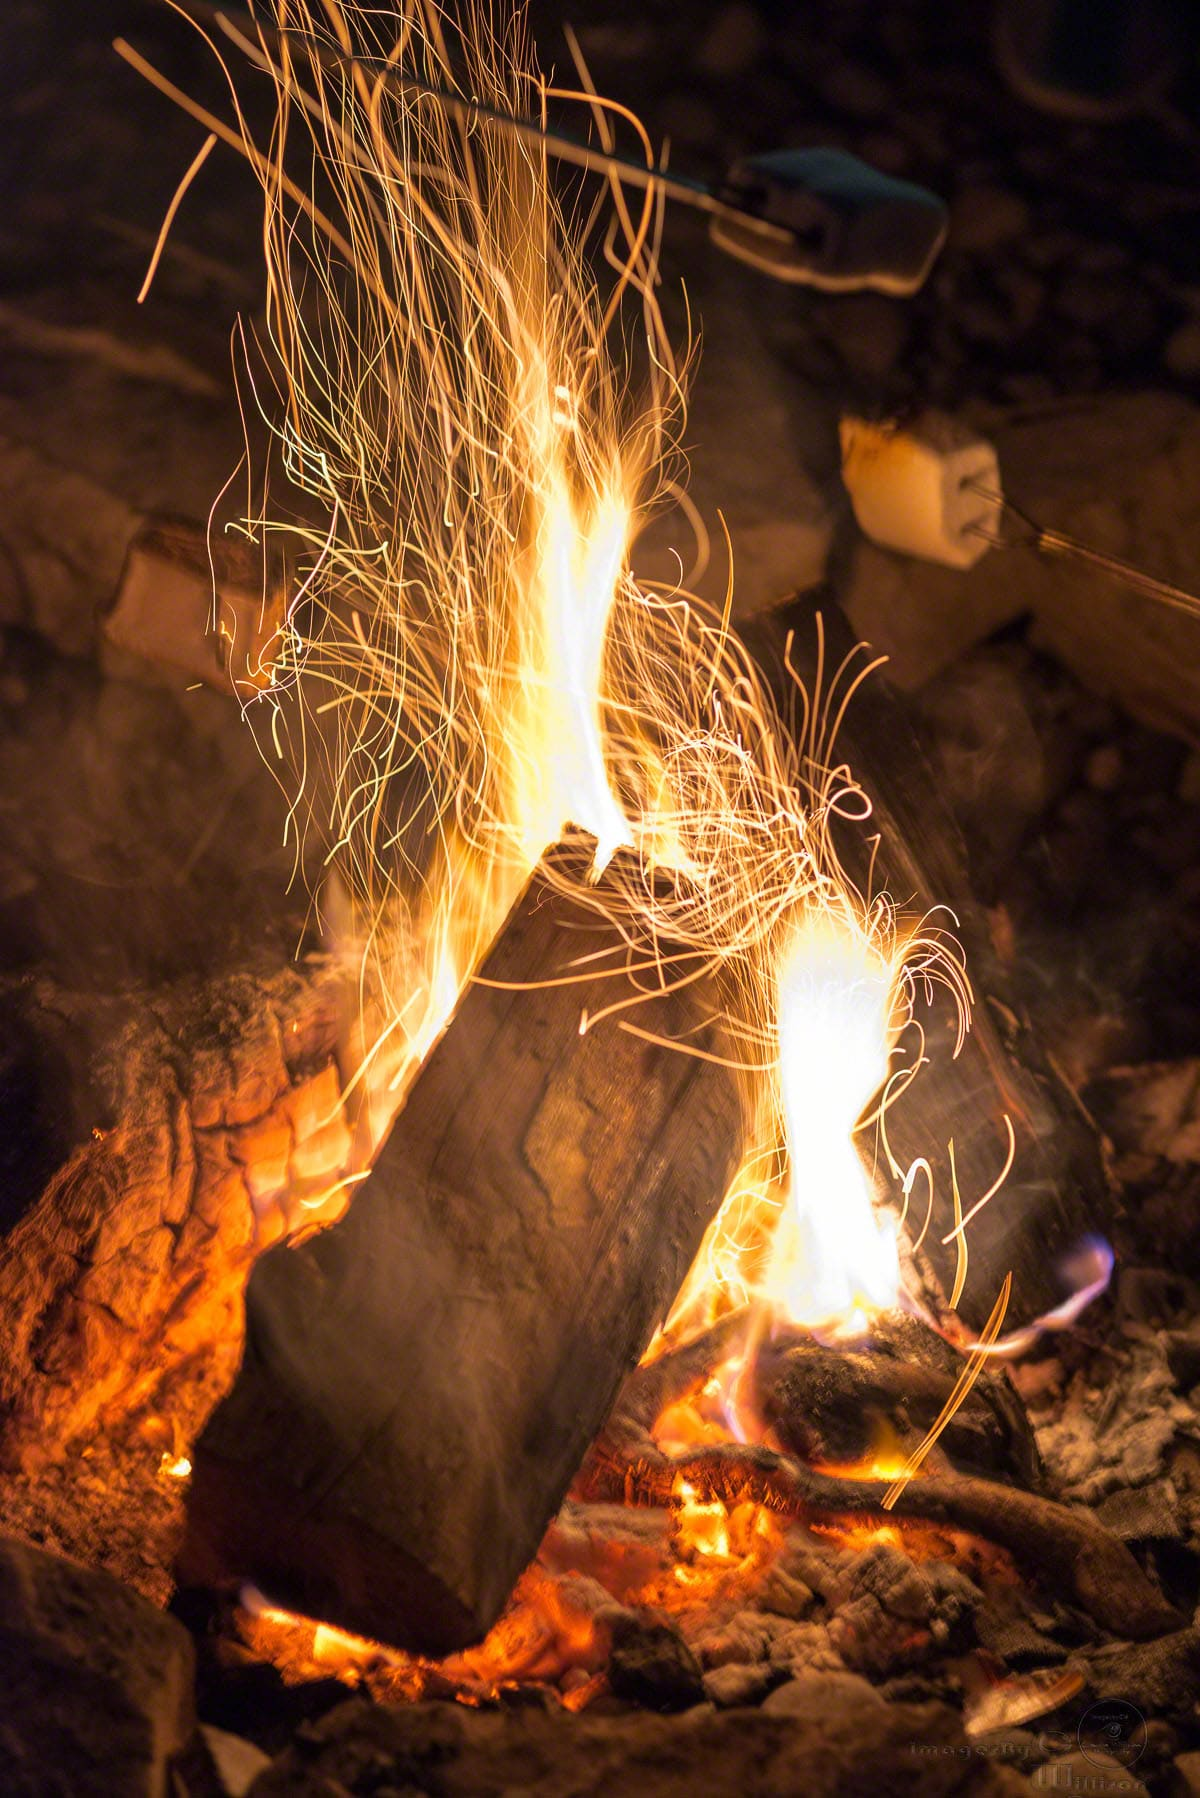 Sparkling Fire & S'mores